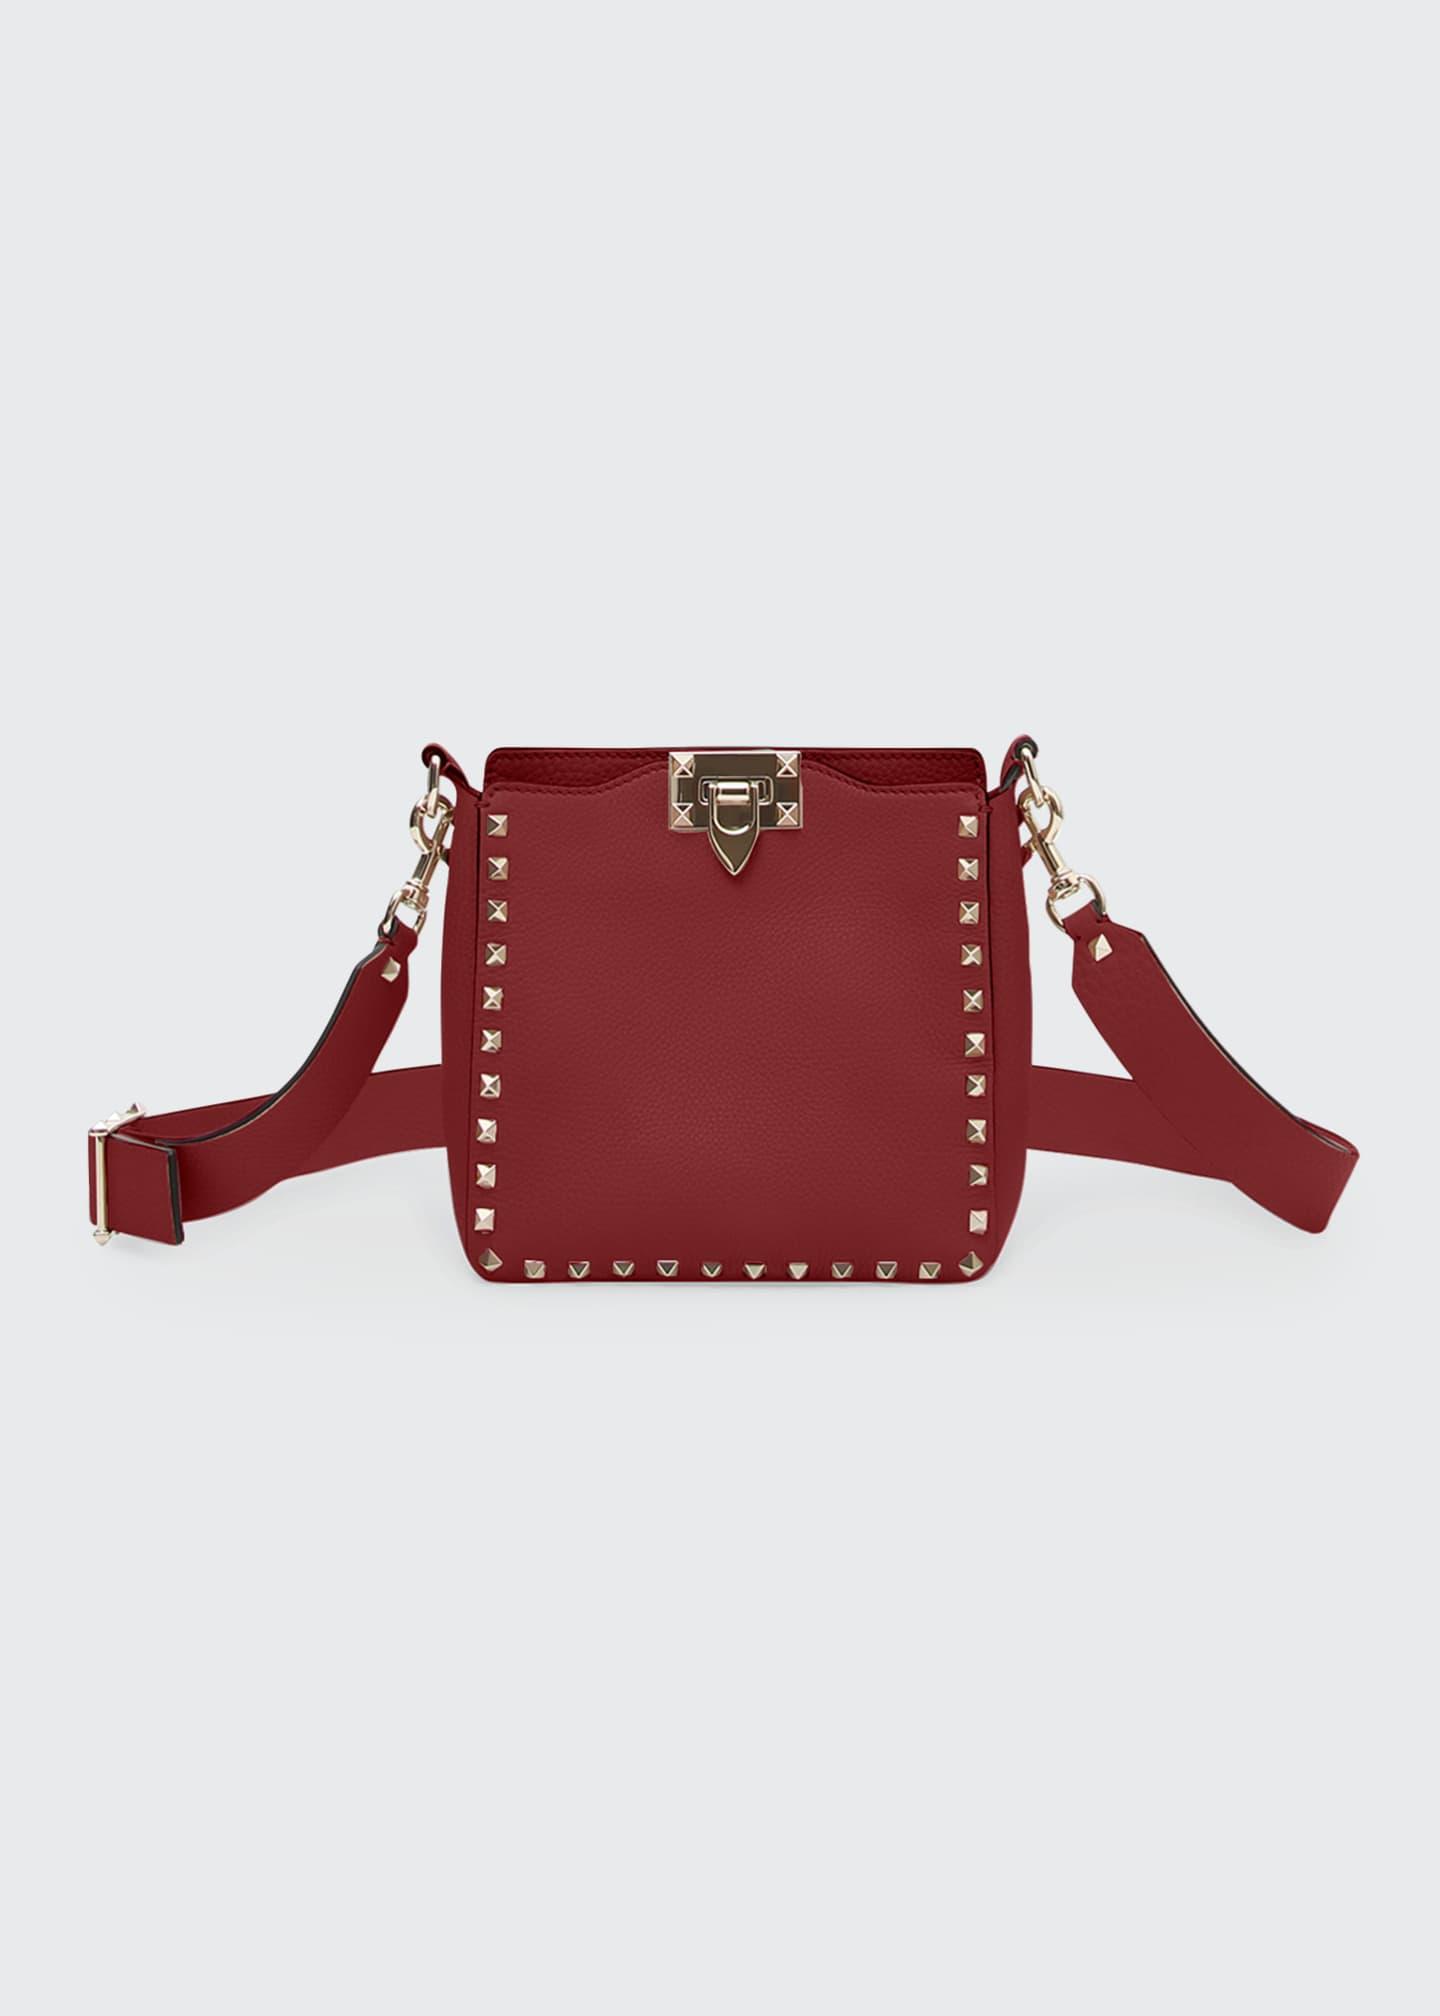 Valentino Garavani Rockstud Mini Vitello Stampa Leather Hobo